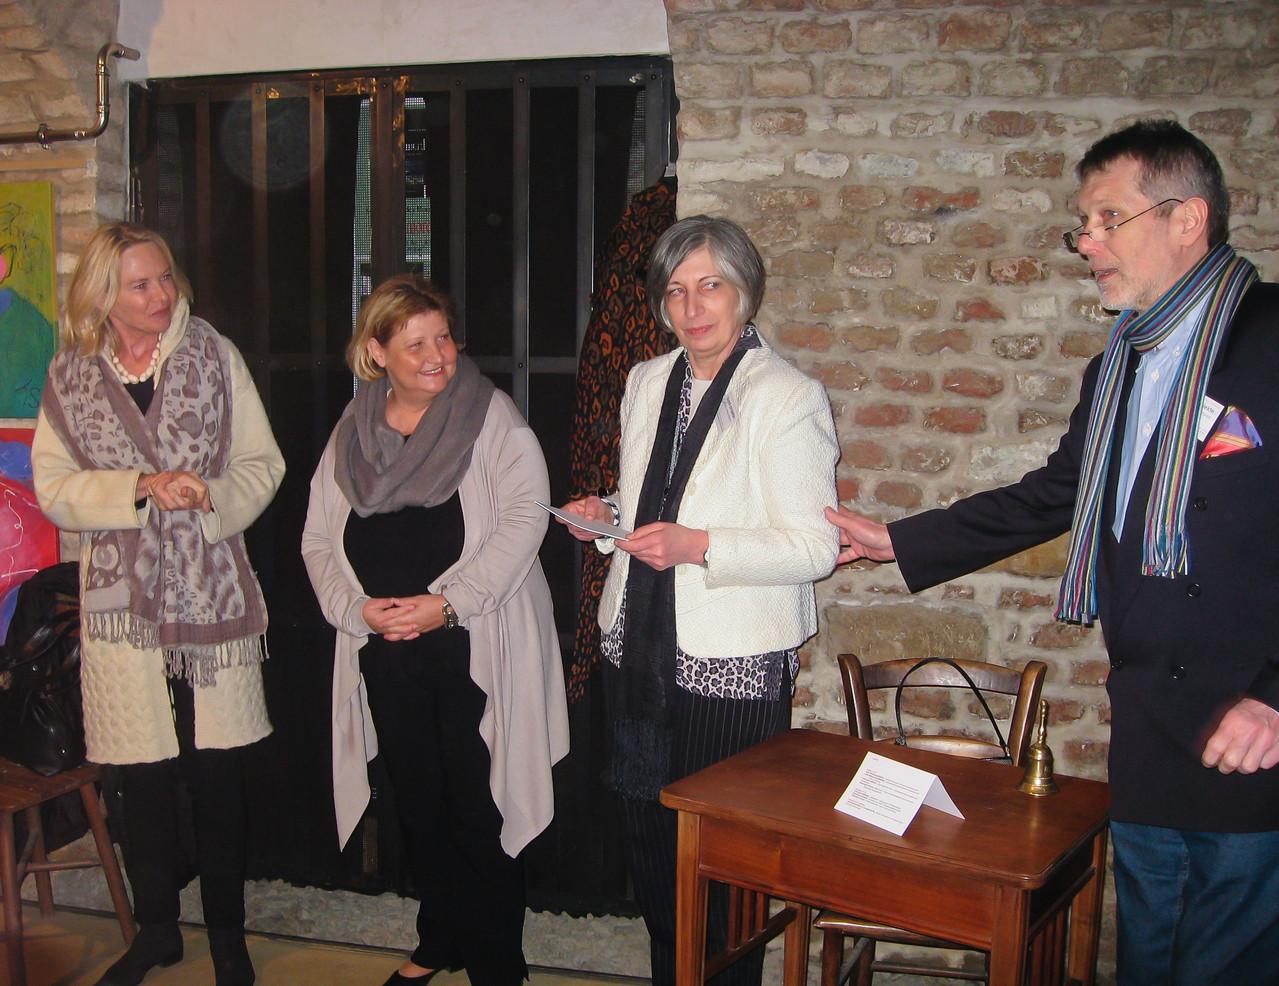 Margret Freund, Martina Maylar, Ursula Pfeiffer, Franz Pfeiffer